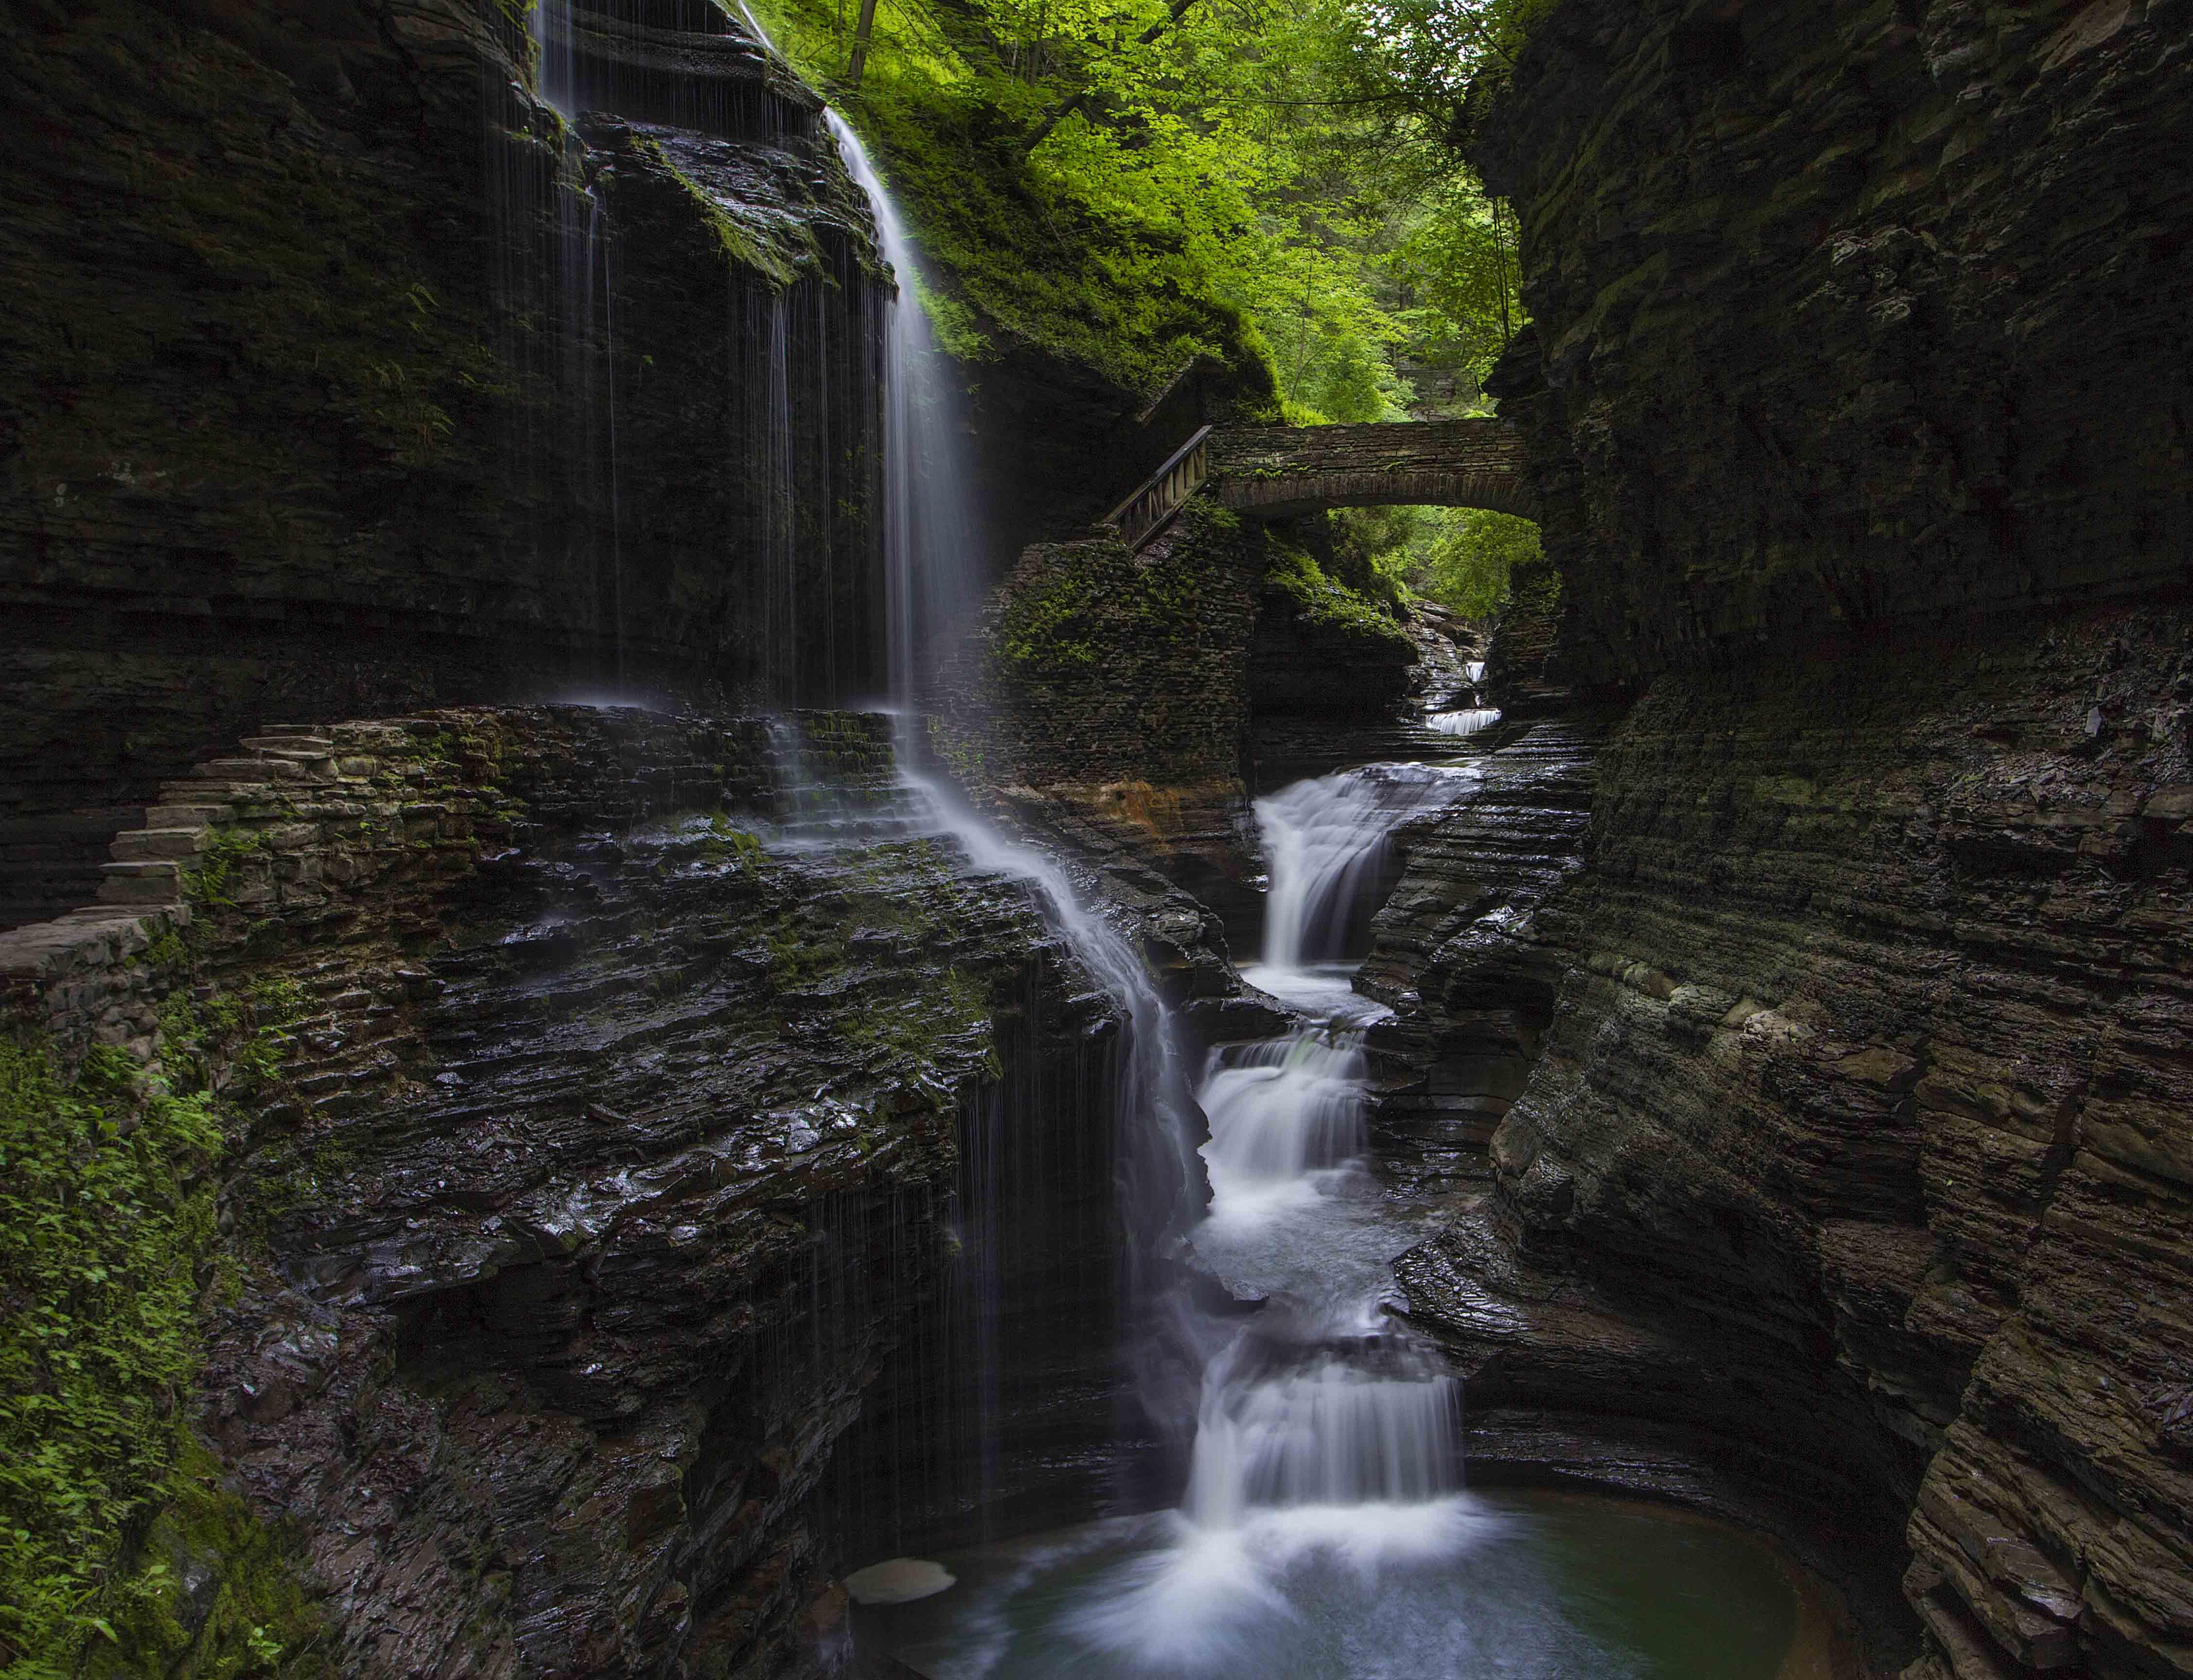 Cascade, Glen creek, Glen watkins, Waterfall, Водопад, Каскад, Екатерина Богданова